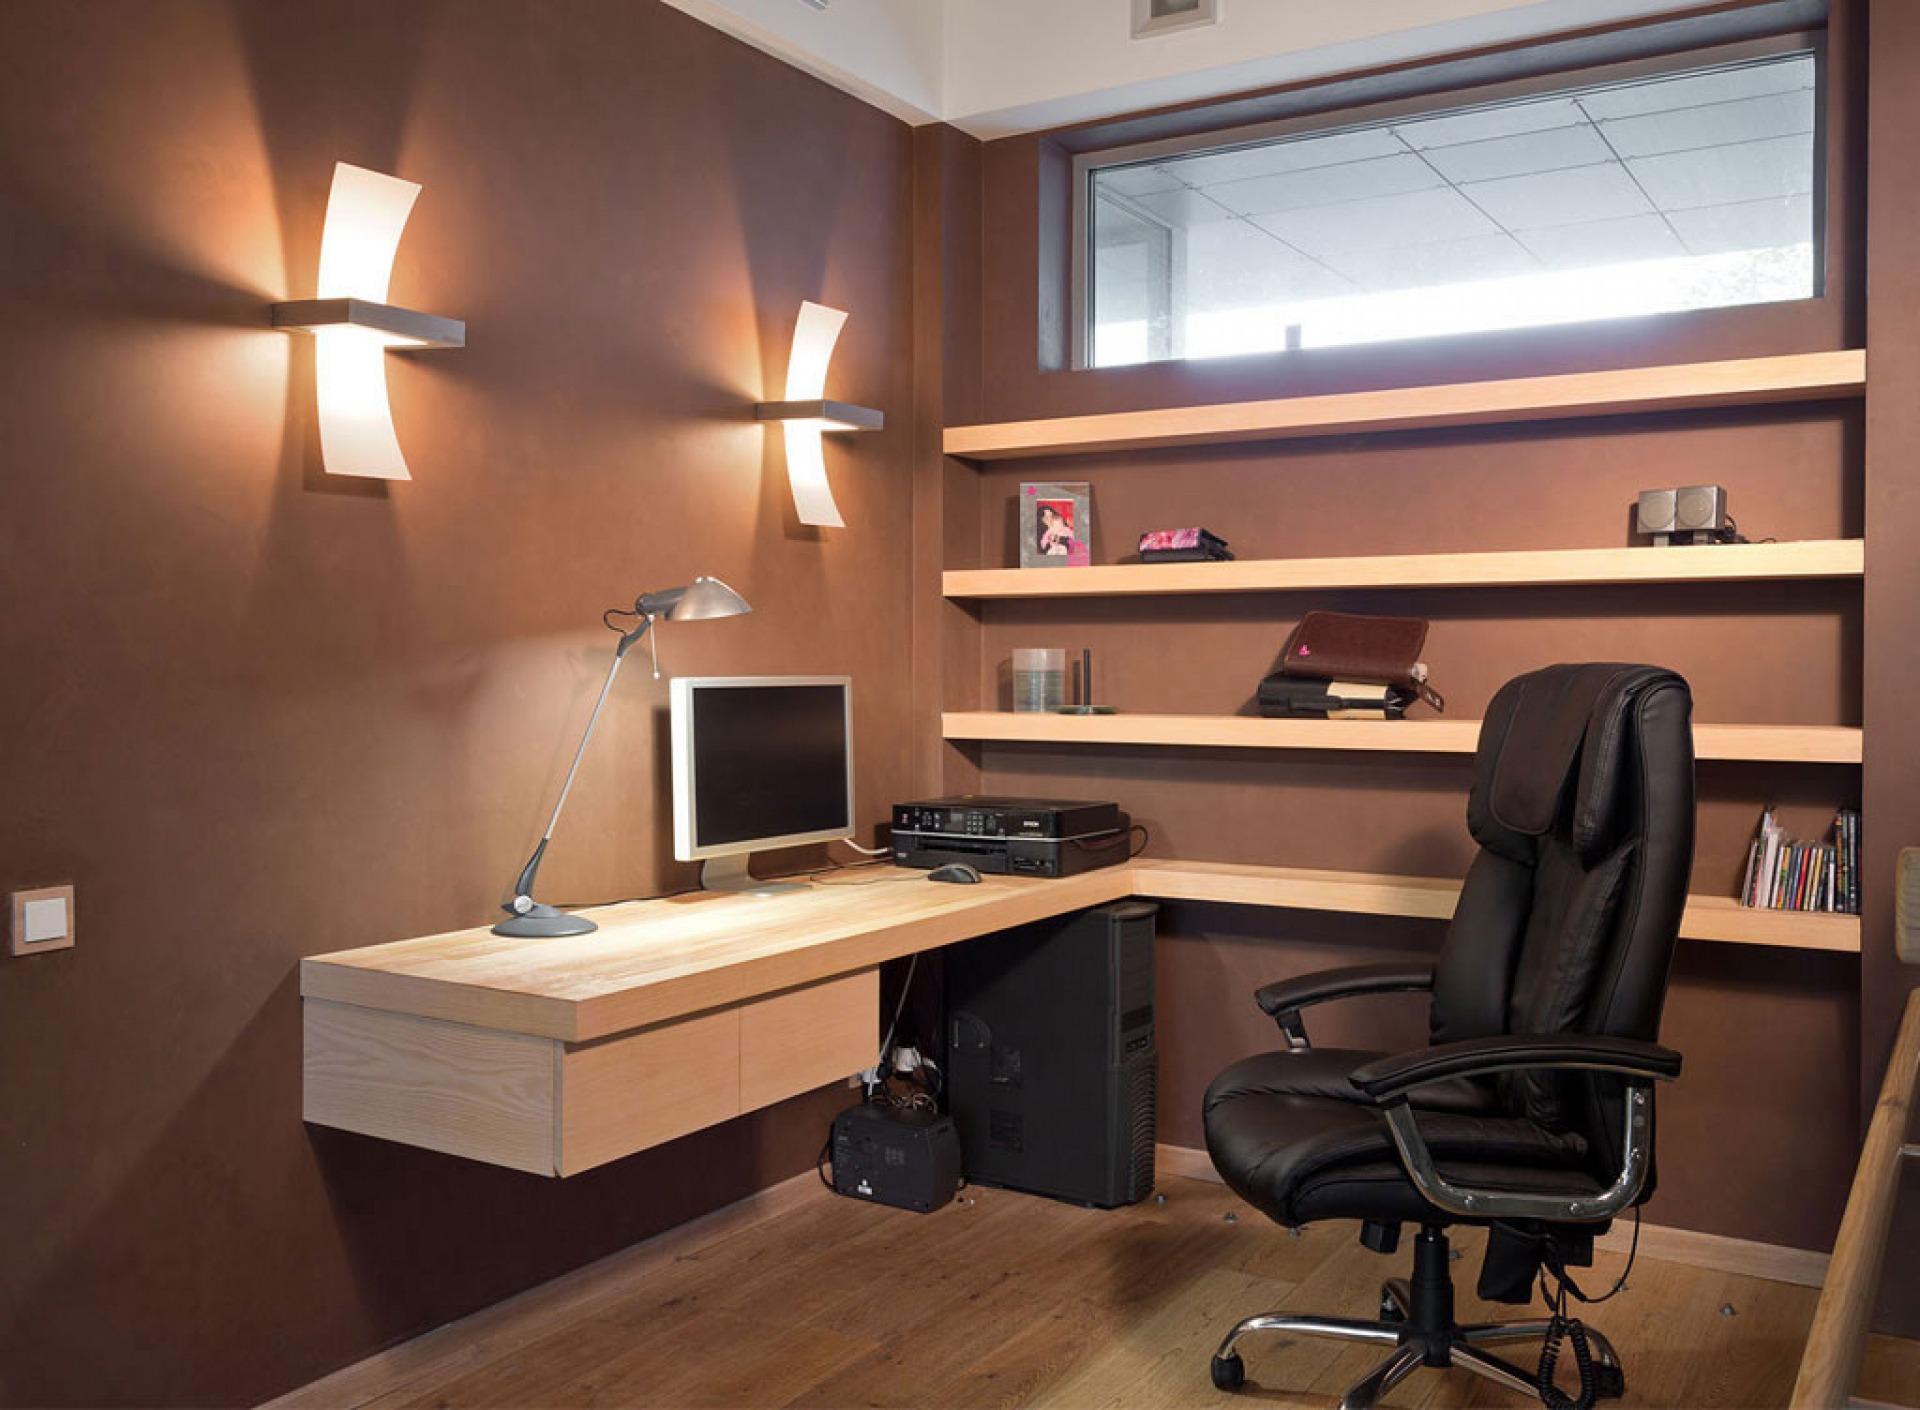 10 Excellent Small Office Interior Design Ideas Archlux Net Rh